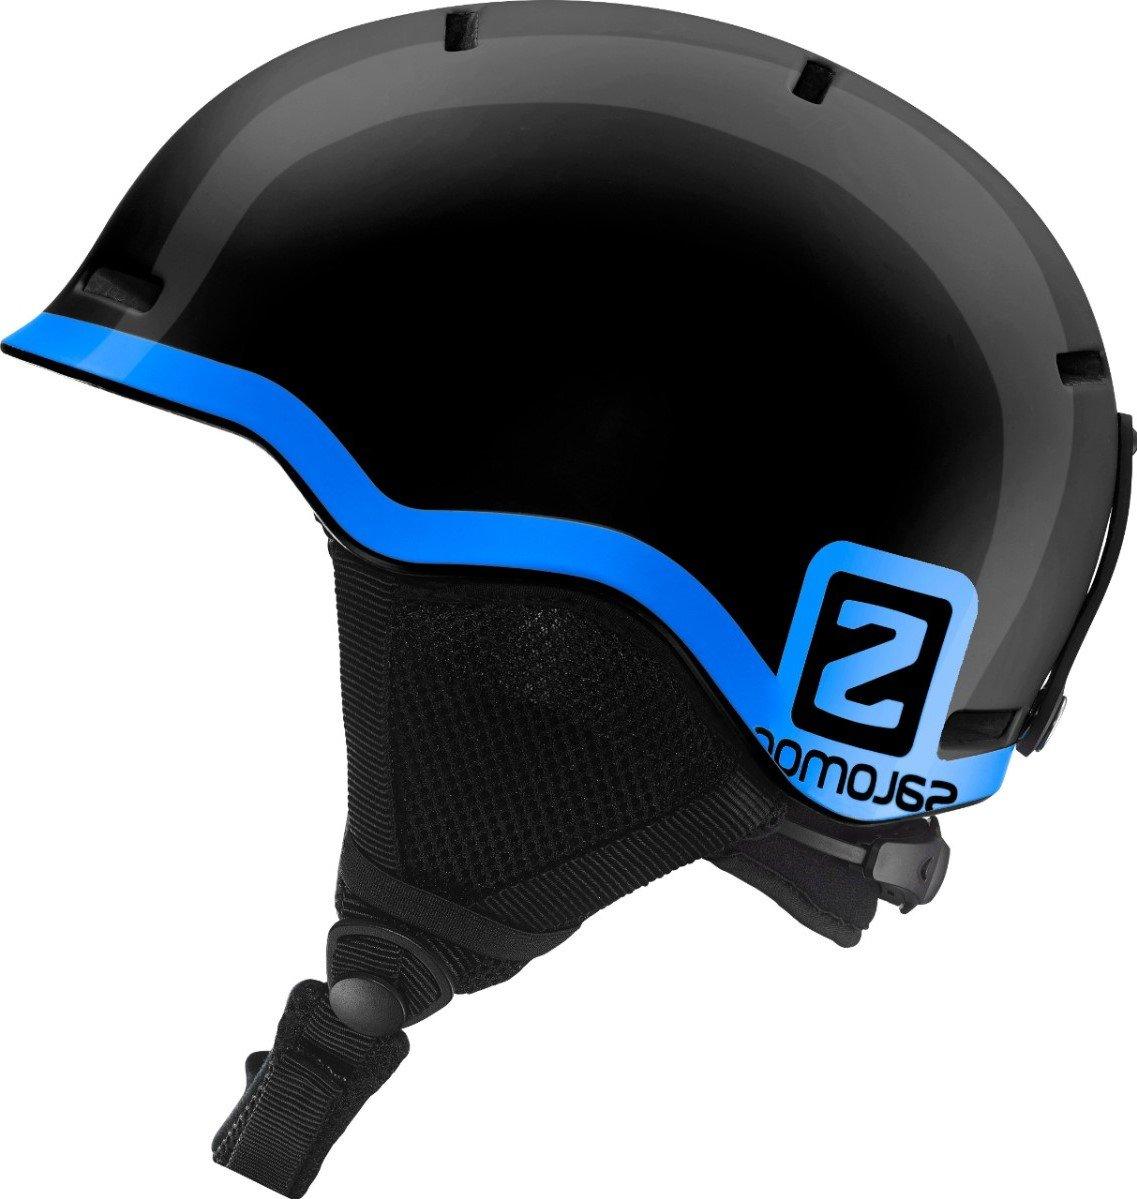 Salomon Grom Helmet 2021